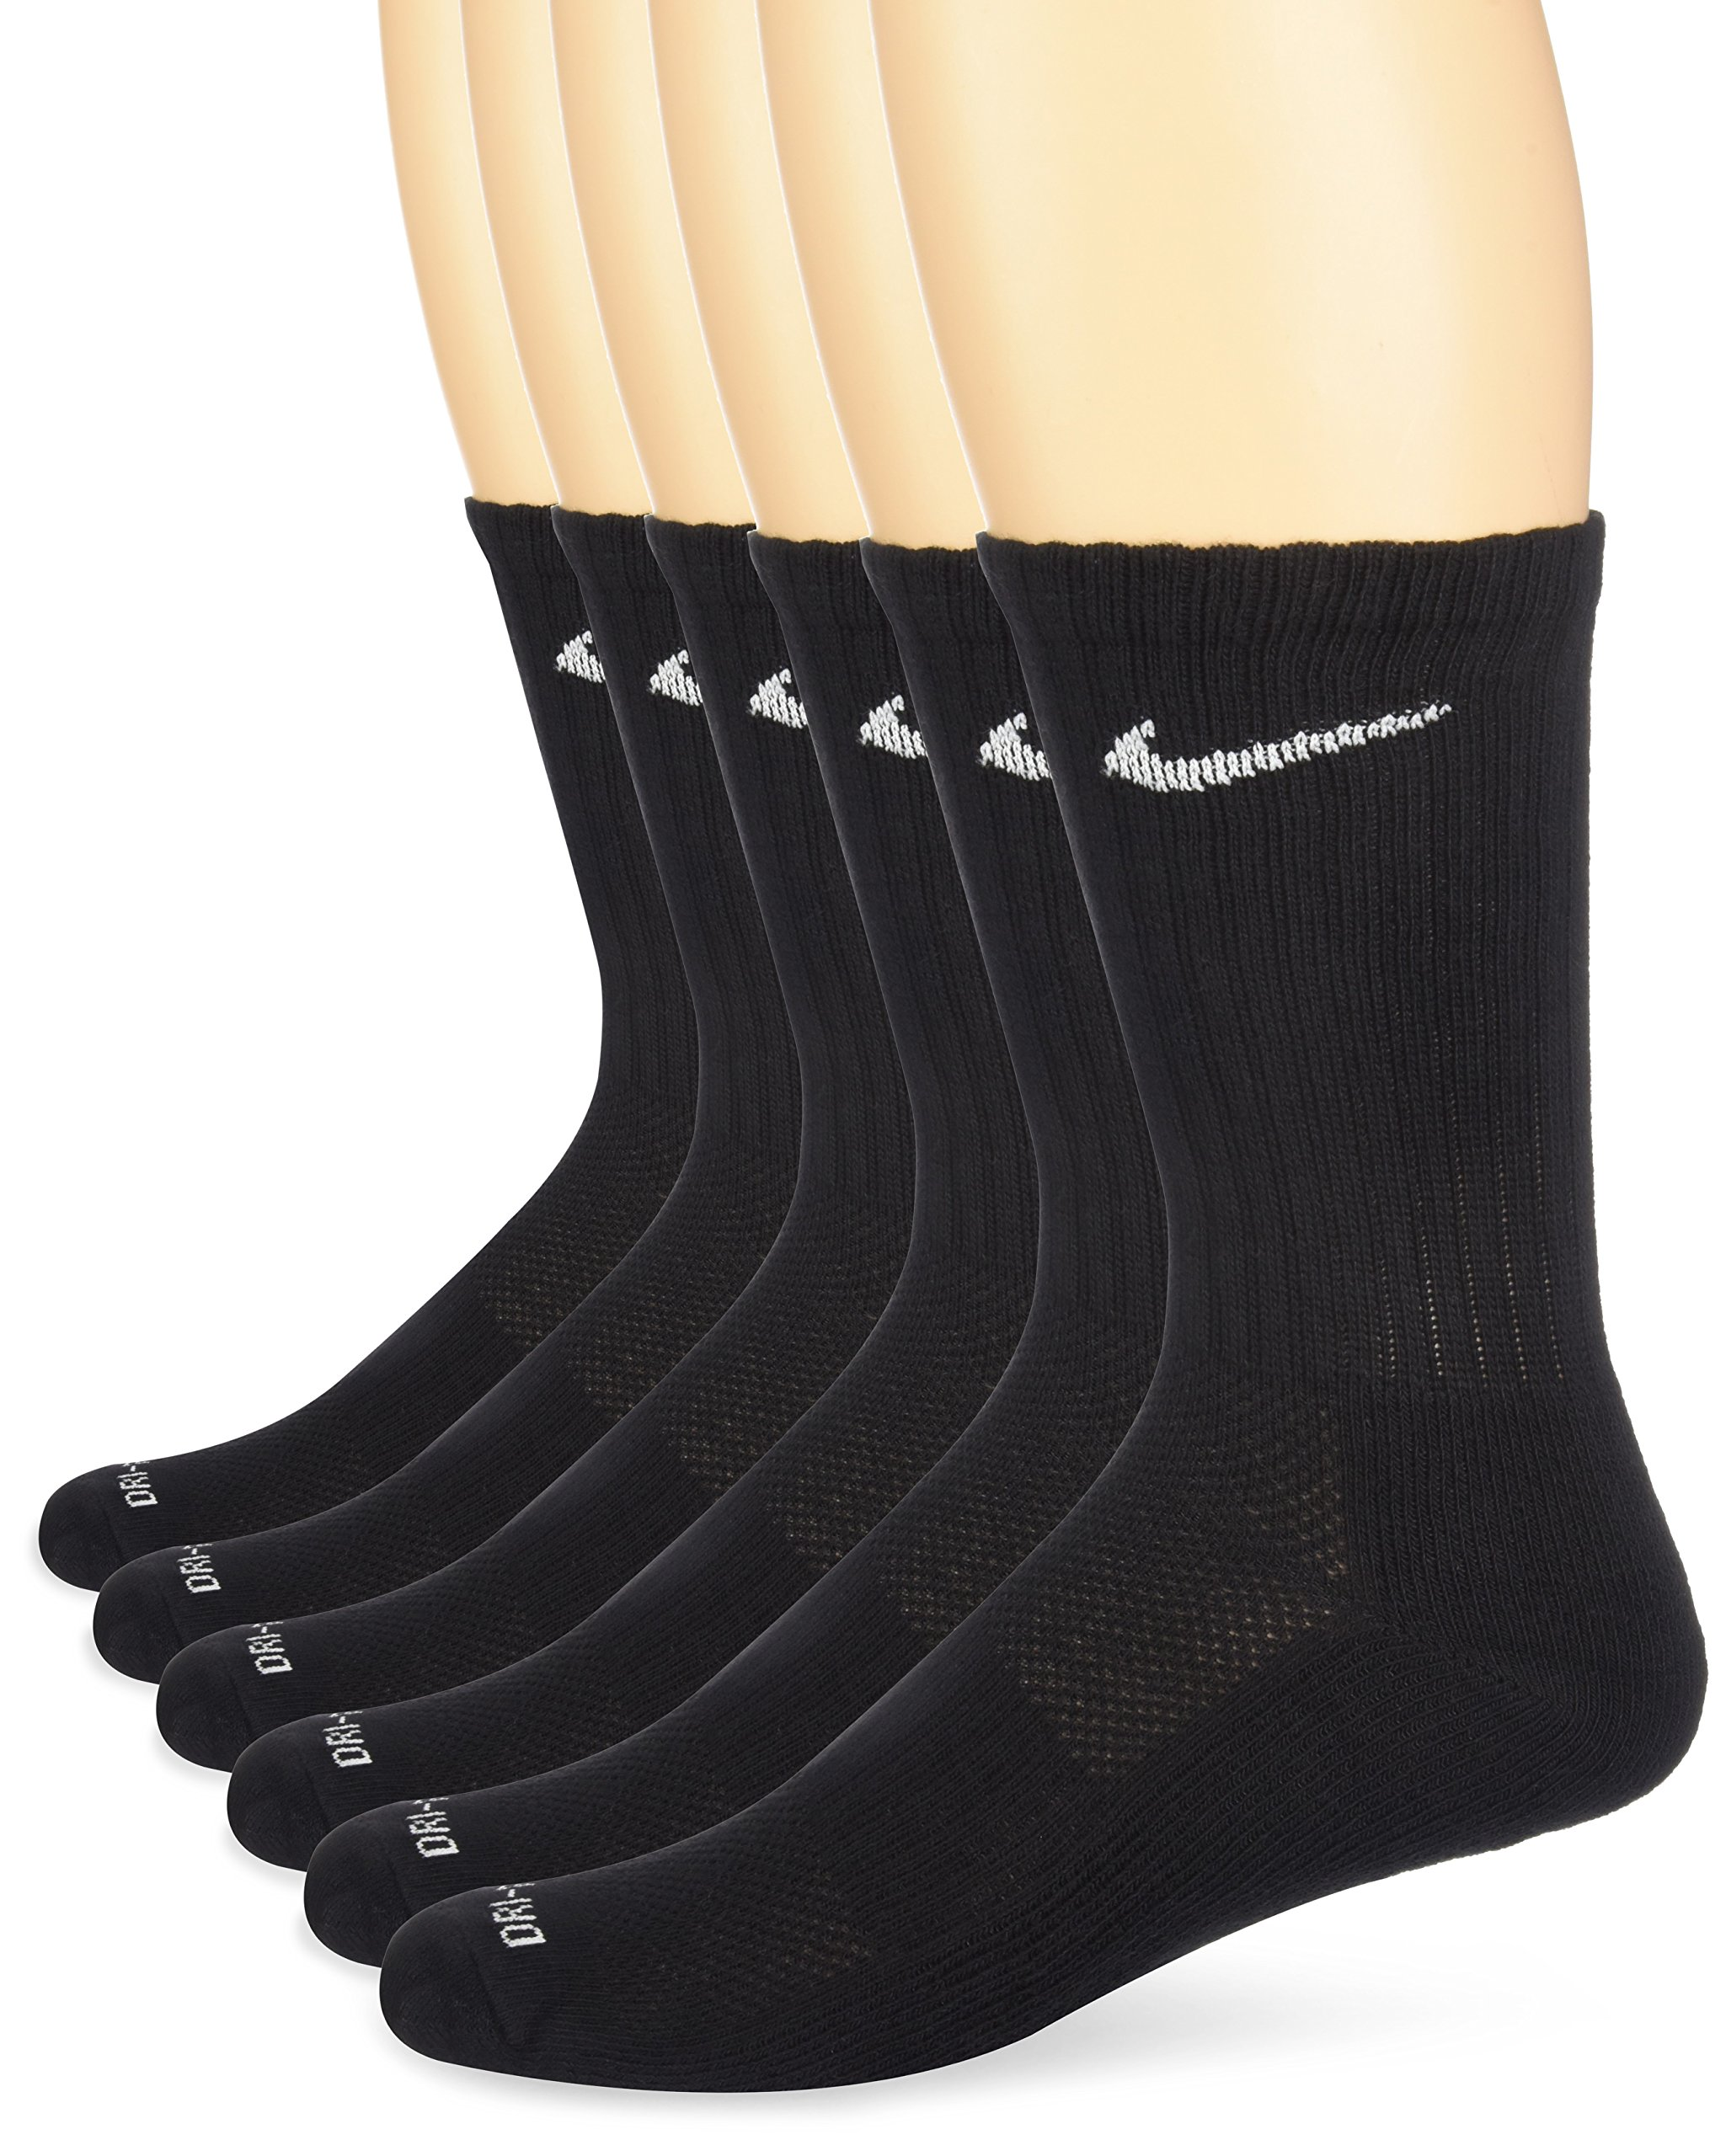 NIKE Unisex Dry Cushion Crew Training Socks (6 Pairs), Black/White, Medium by Nike